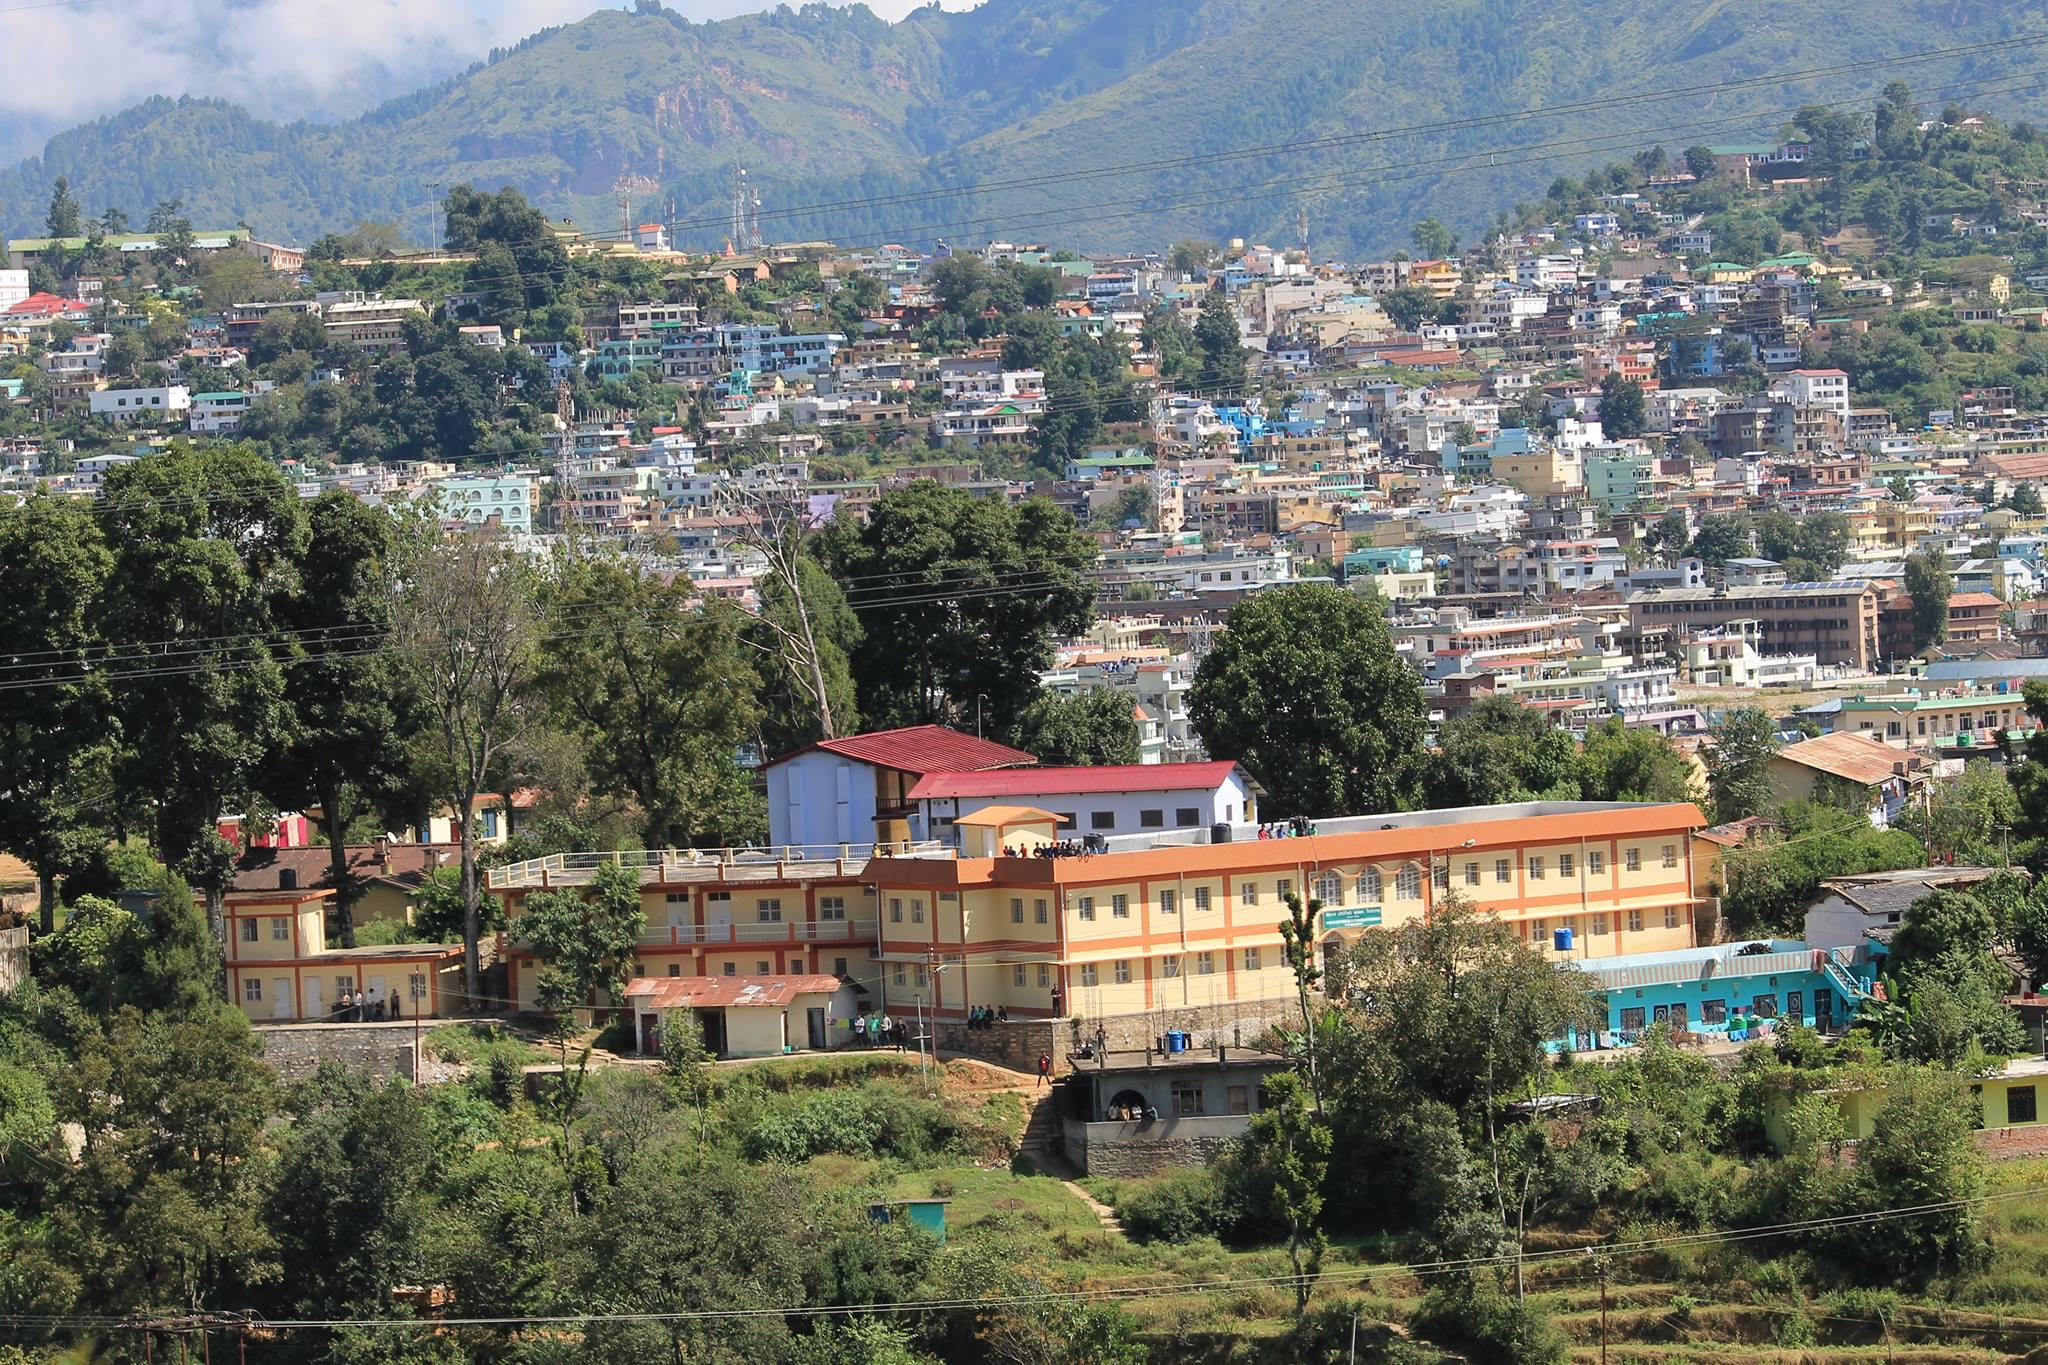 Pithoragarh Popular Place To Visit In Uttarakhand